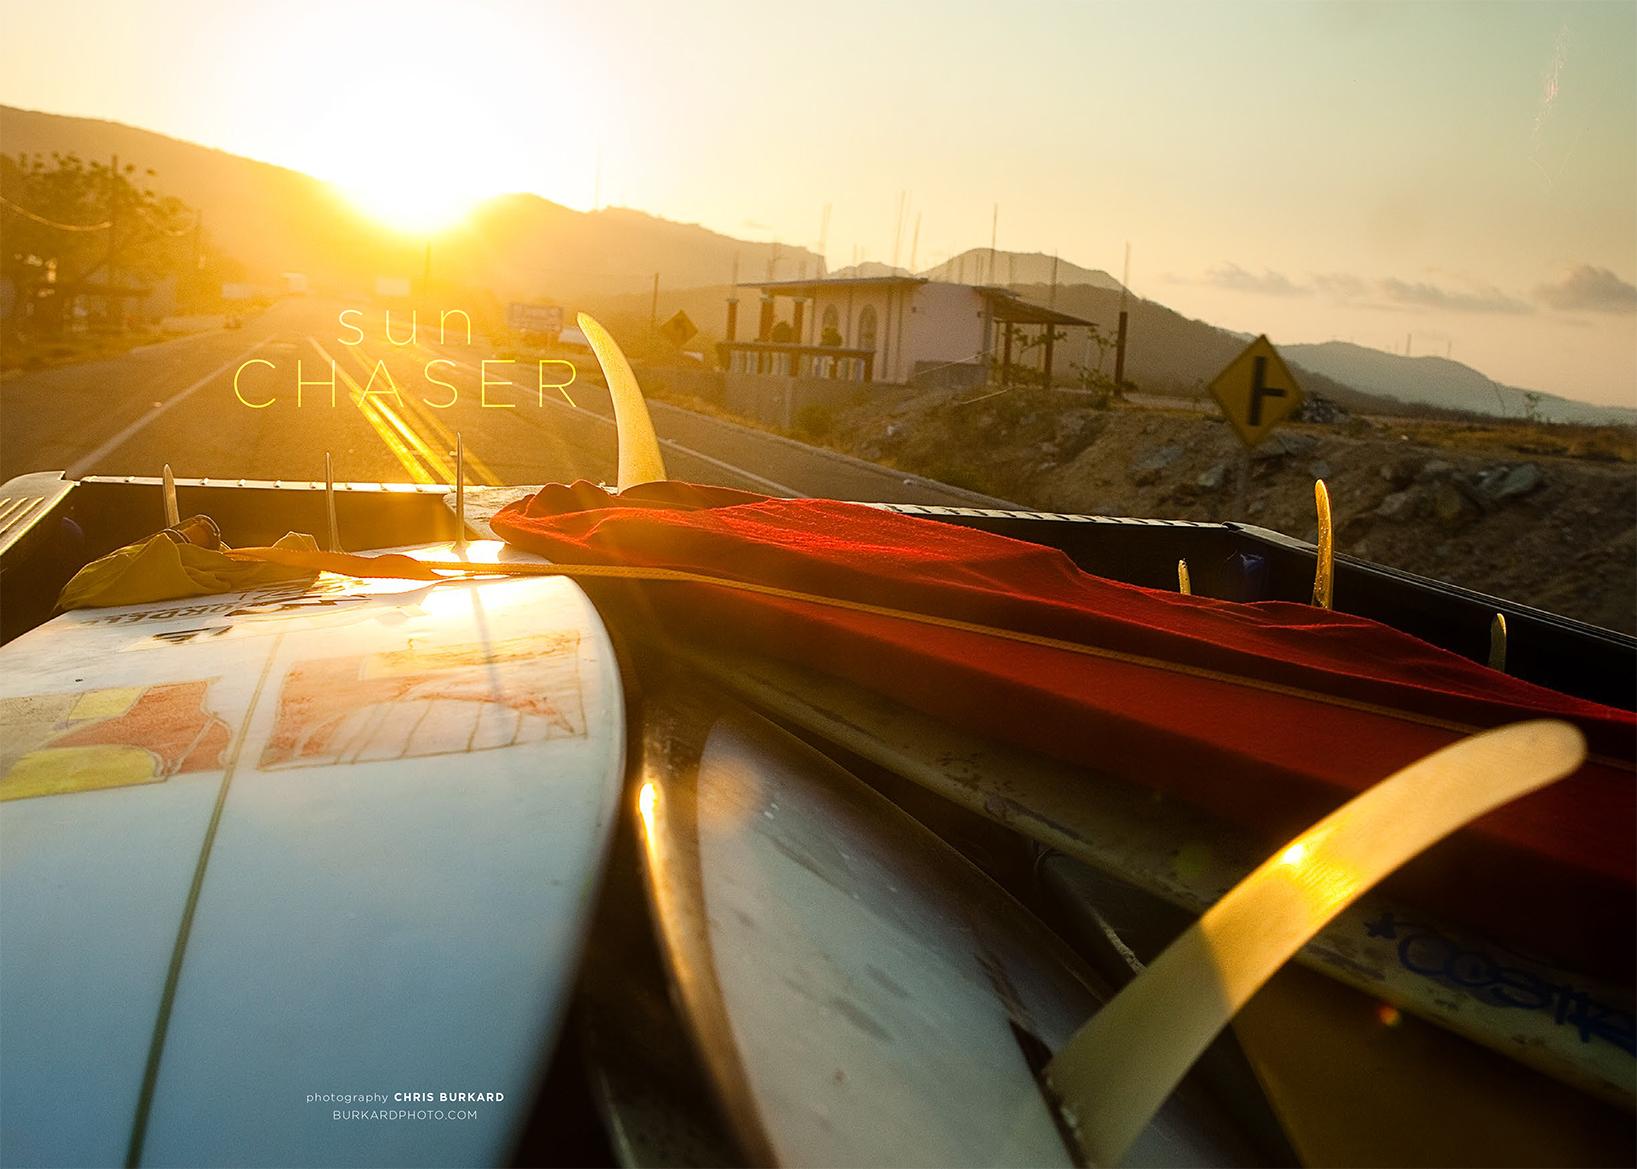 """SUN CHASER""   PHOTOGRAPHER / Chris Burkard  view story"